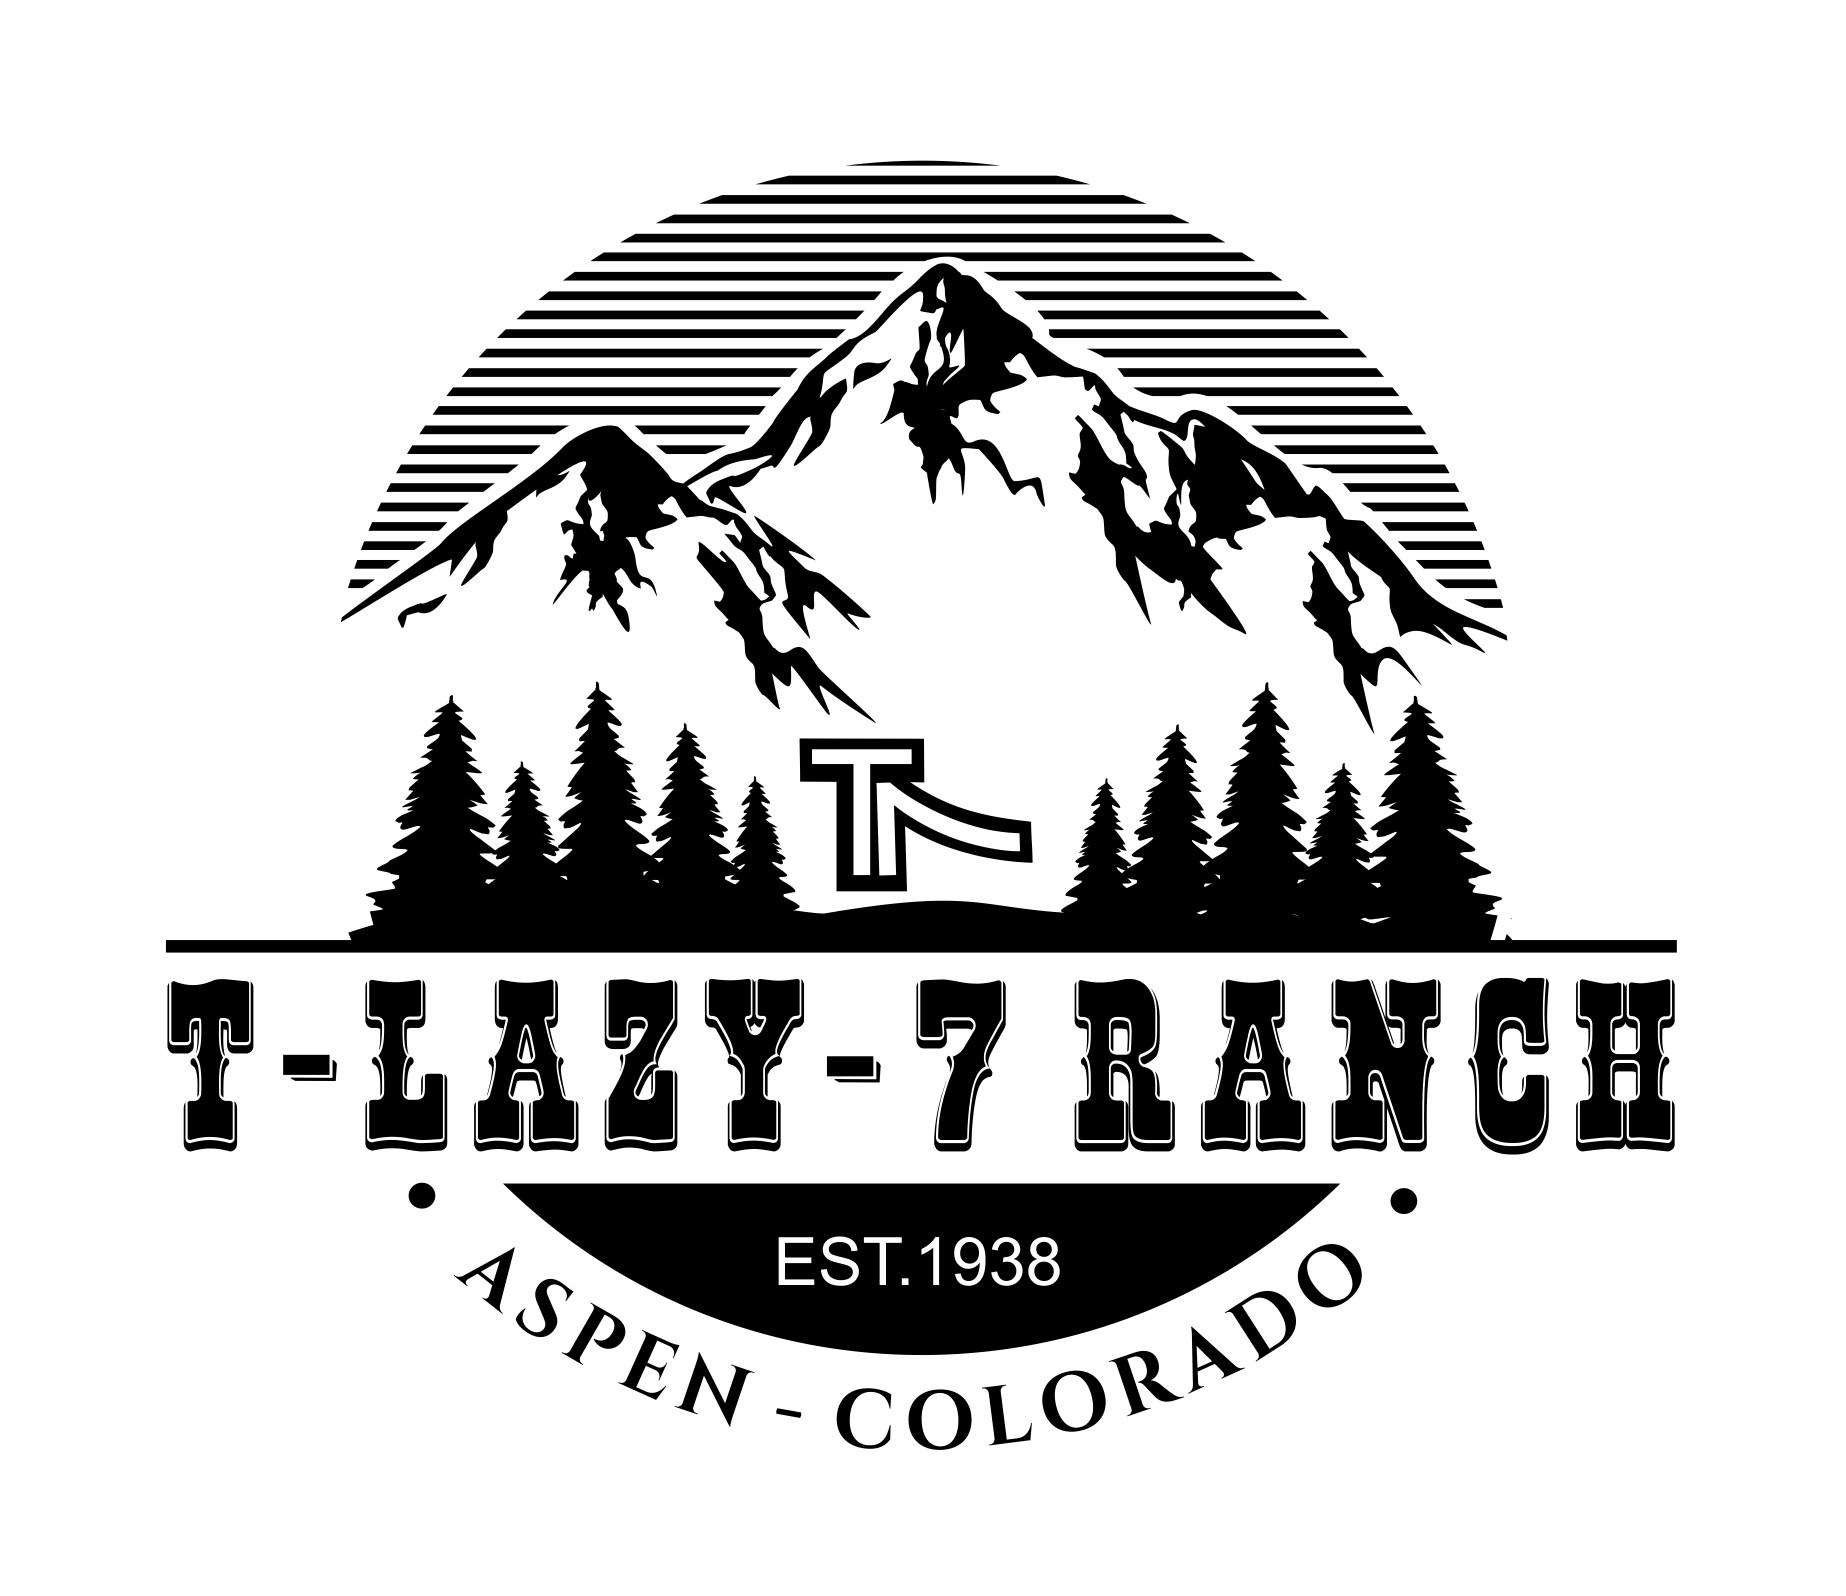 Create a western-chic logo for a recreational activities ranch in Aspen, Colorado!